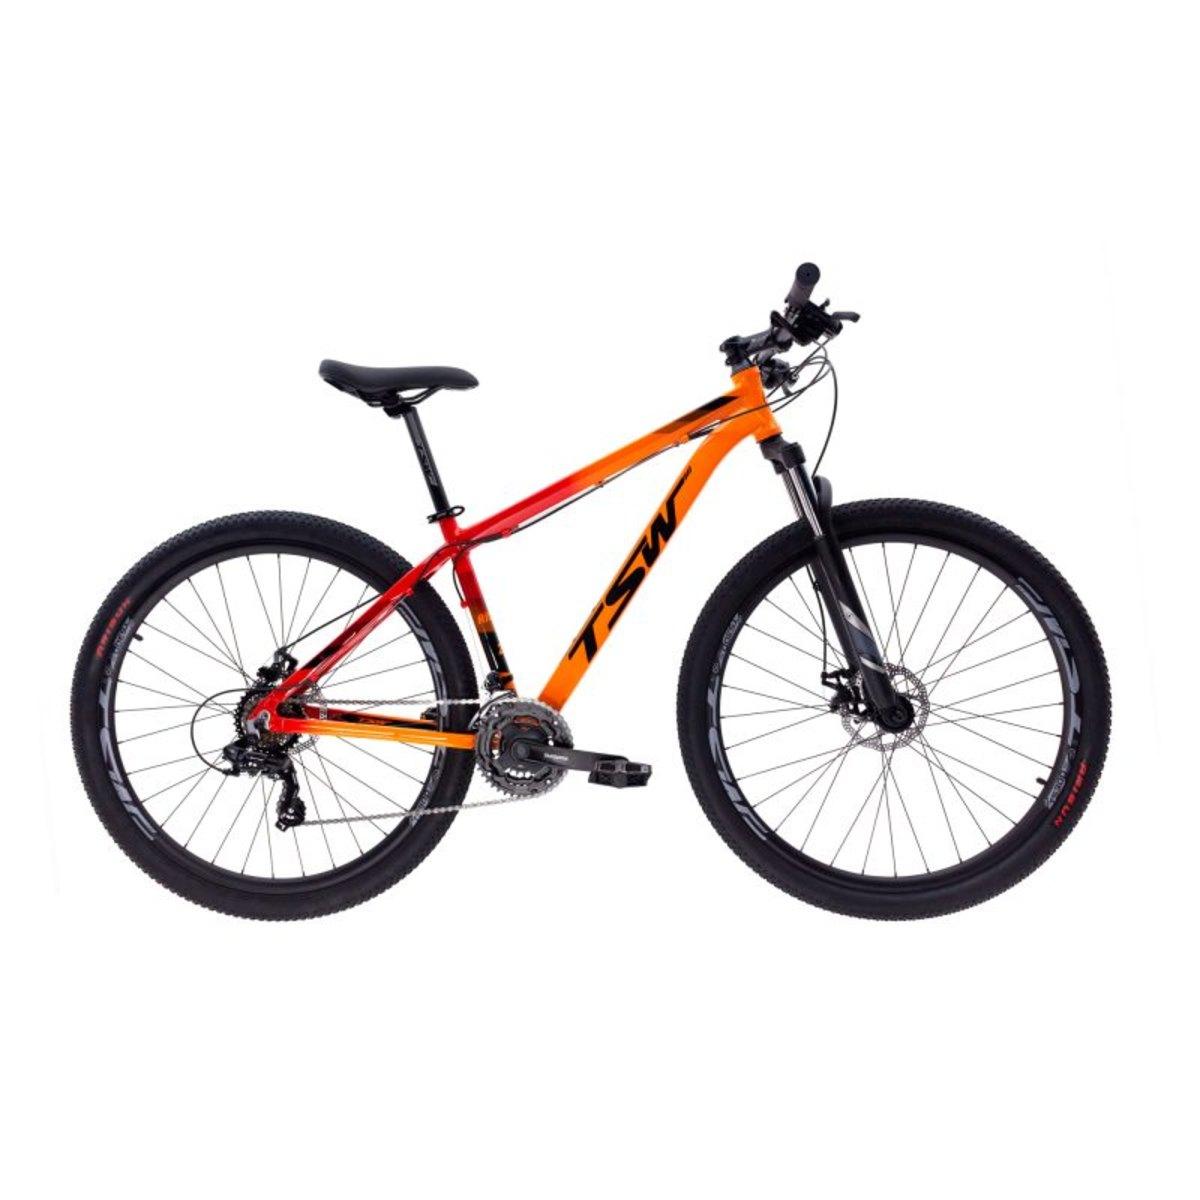 "TSW Ride 2019 29 Alaranjado/Vermelho Tam. 17"""